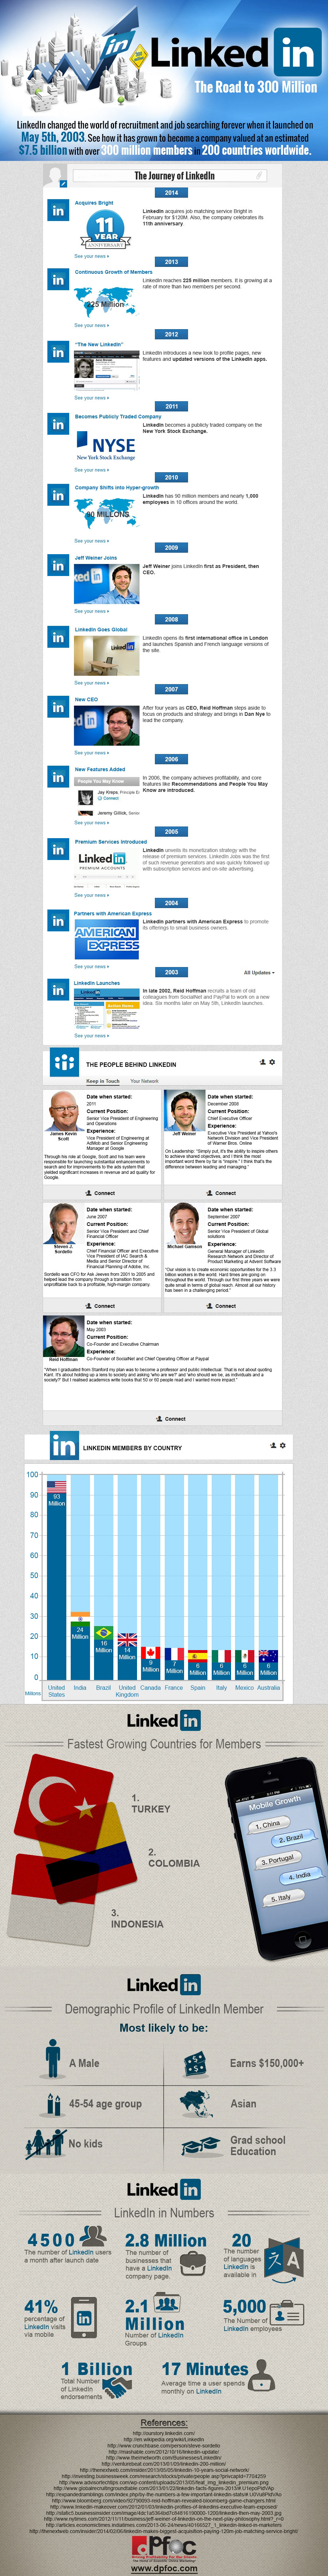 LinkedIn Numbers Info 2003-2014